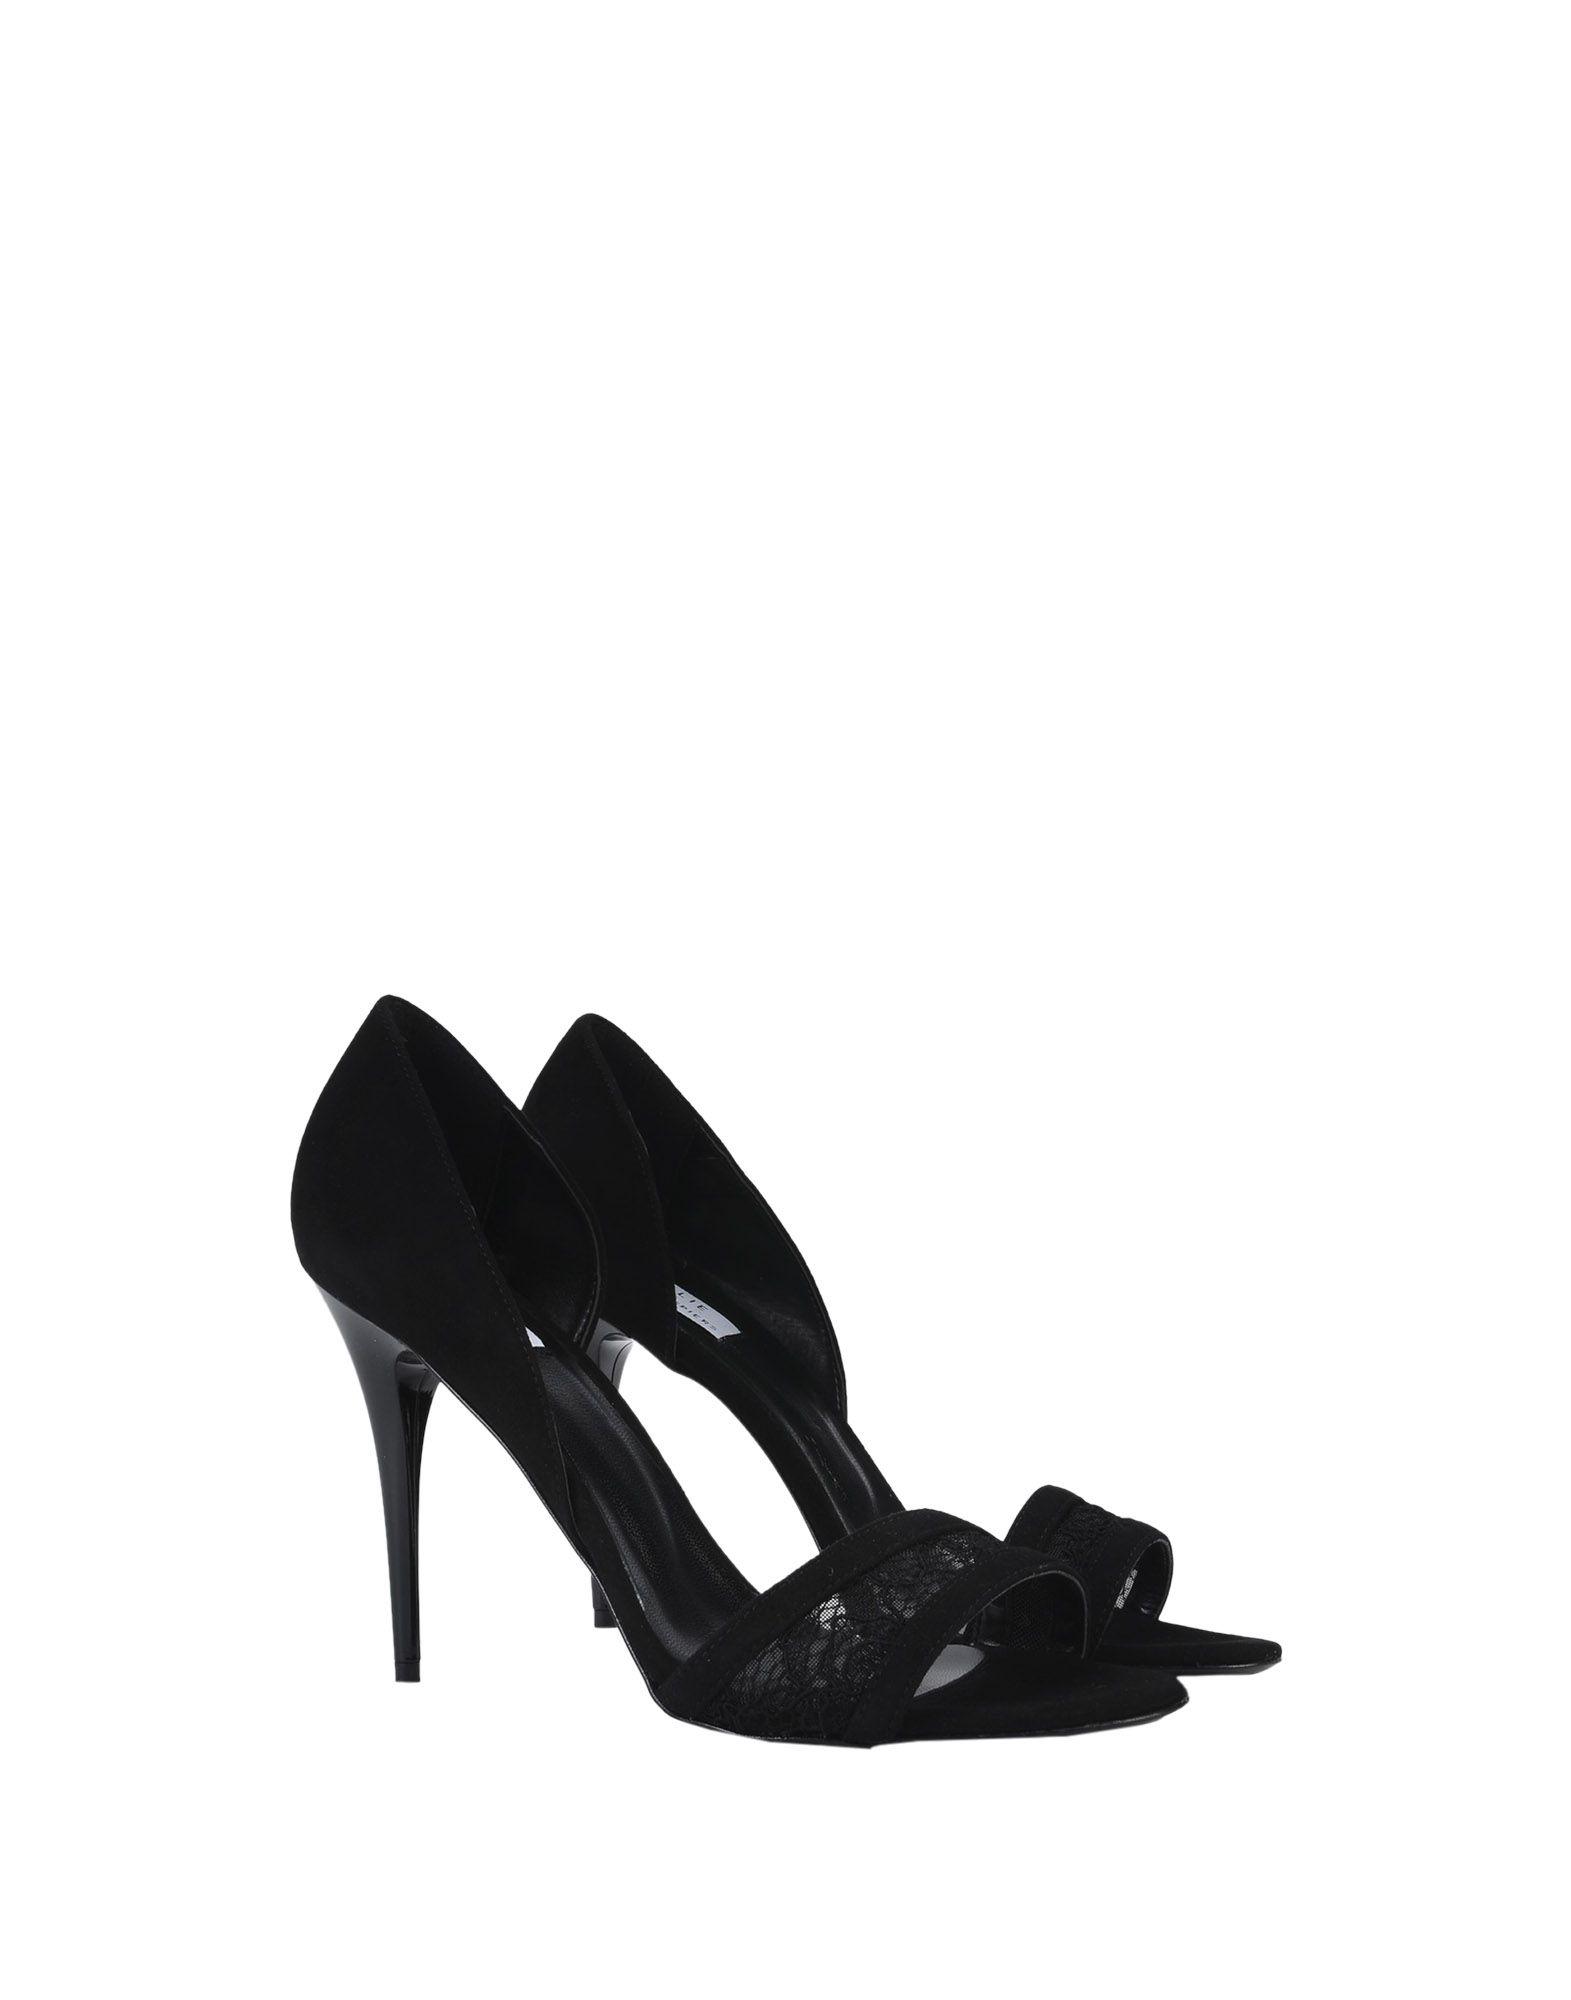 Jolie By Edward Spiers Sandalen Damen  11477684EL Gute Qualität beliebte Schuhe